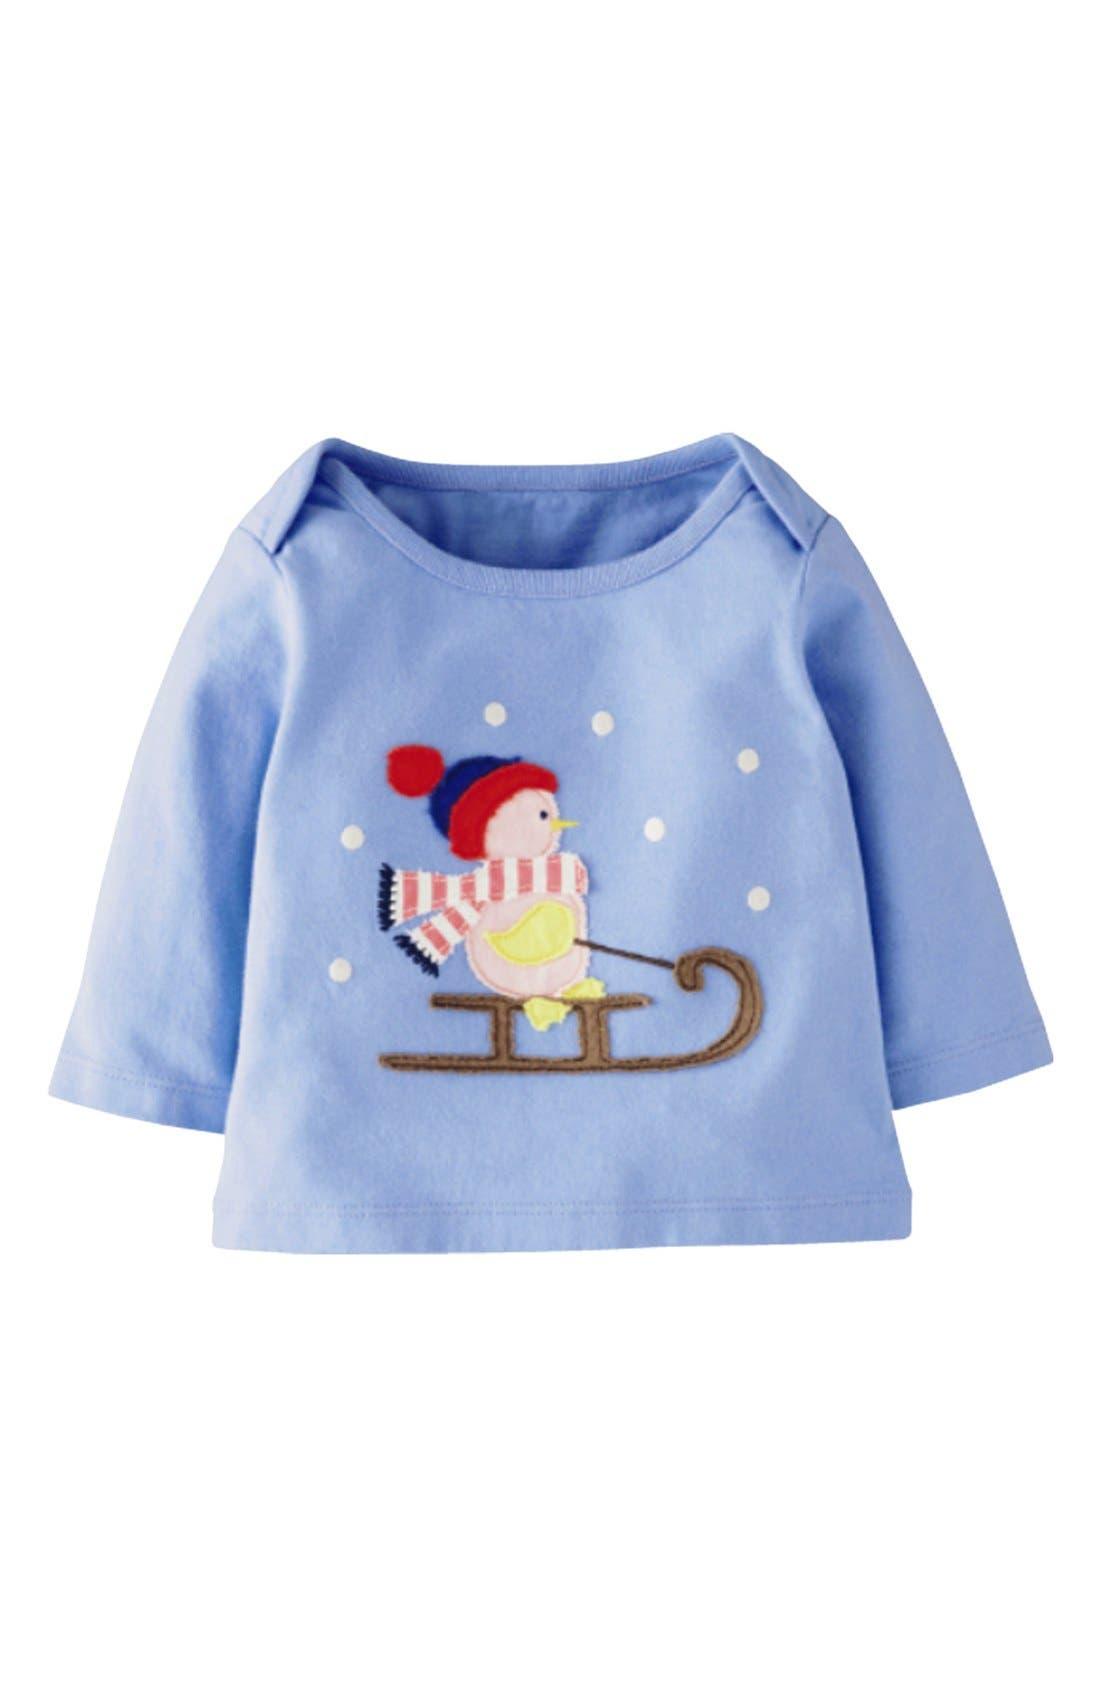 Main Image - Mini Boden 'Festive' Appliqué Tee (Baby Girls)